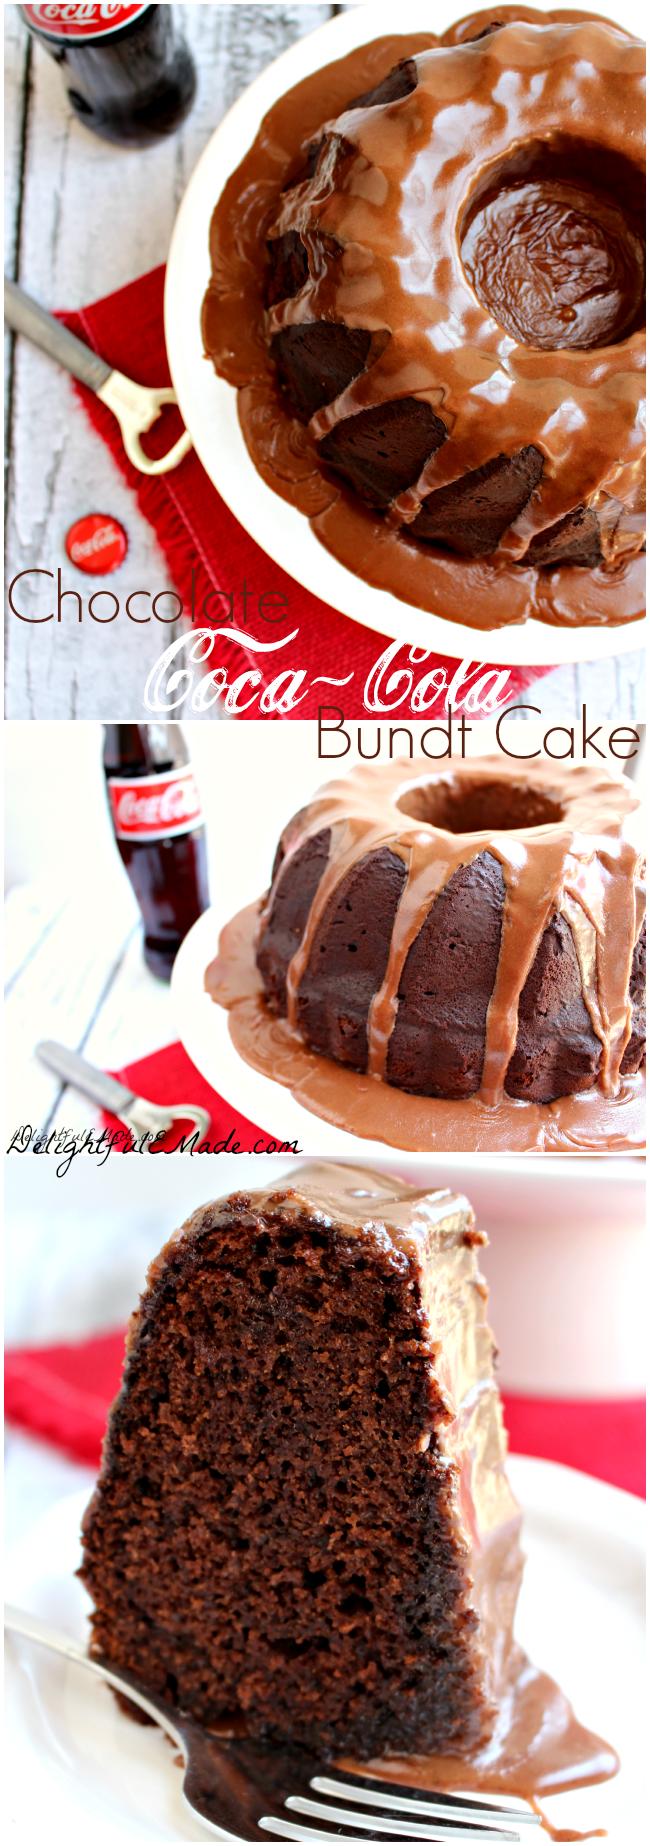 The most decadent chocolate cake! Moist, delicious chocolate cake topped with a delicious Coca Cola glaze. One amazing dessert!